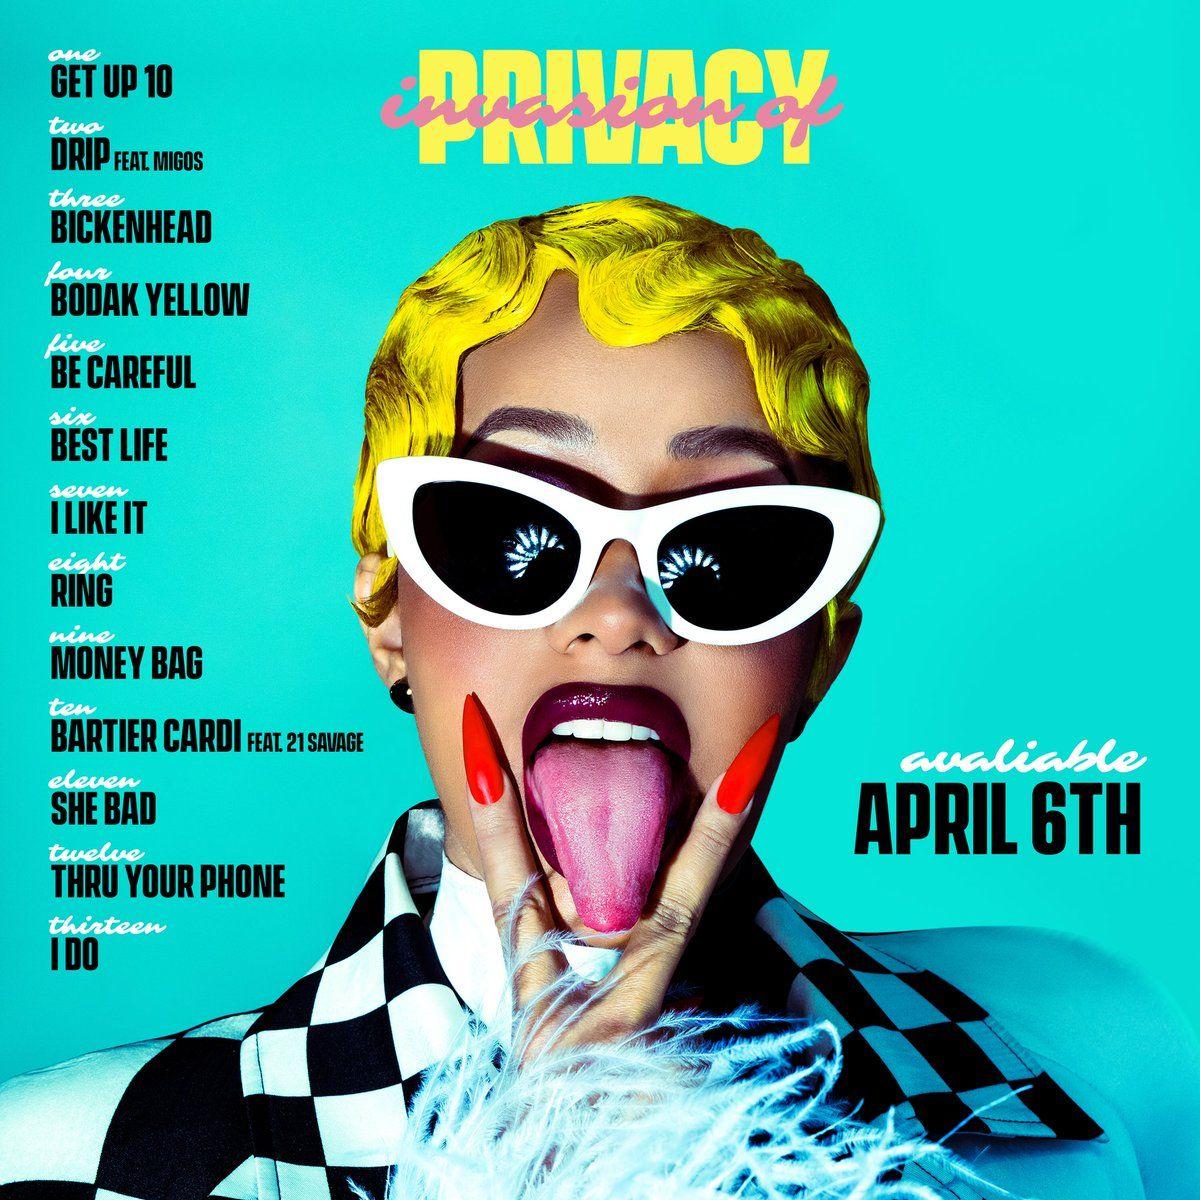 B-134 Nipsey Hussle Poster New Rapper 2019 Hip Hop Music Album Art Wall Print